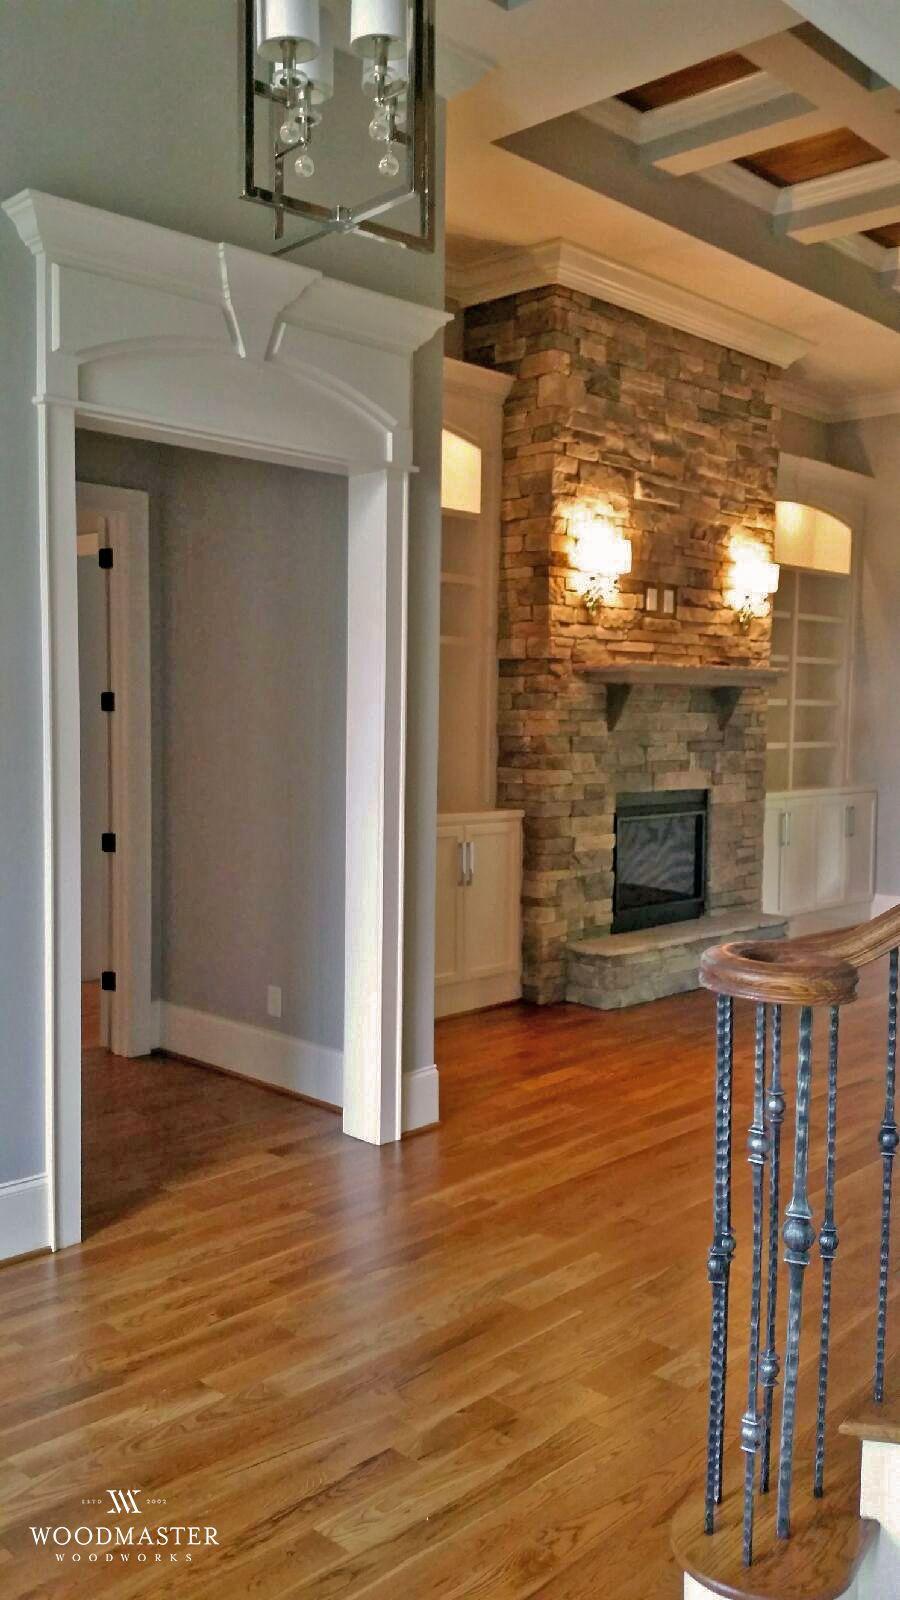 Case Opening Craftsman Trim Updating House House Trim House Flooring